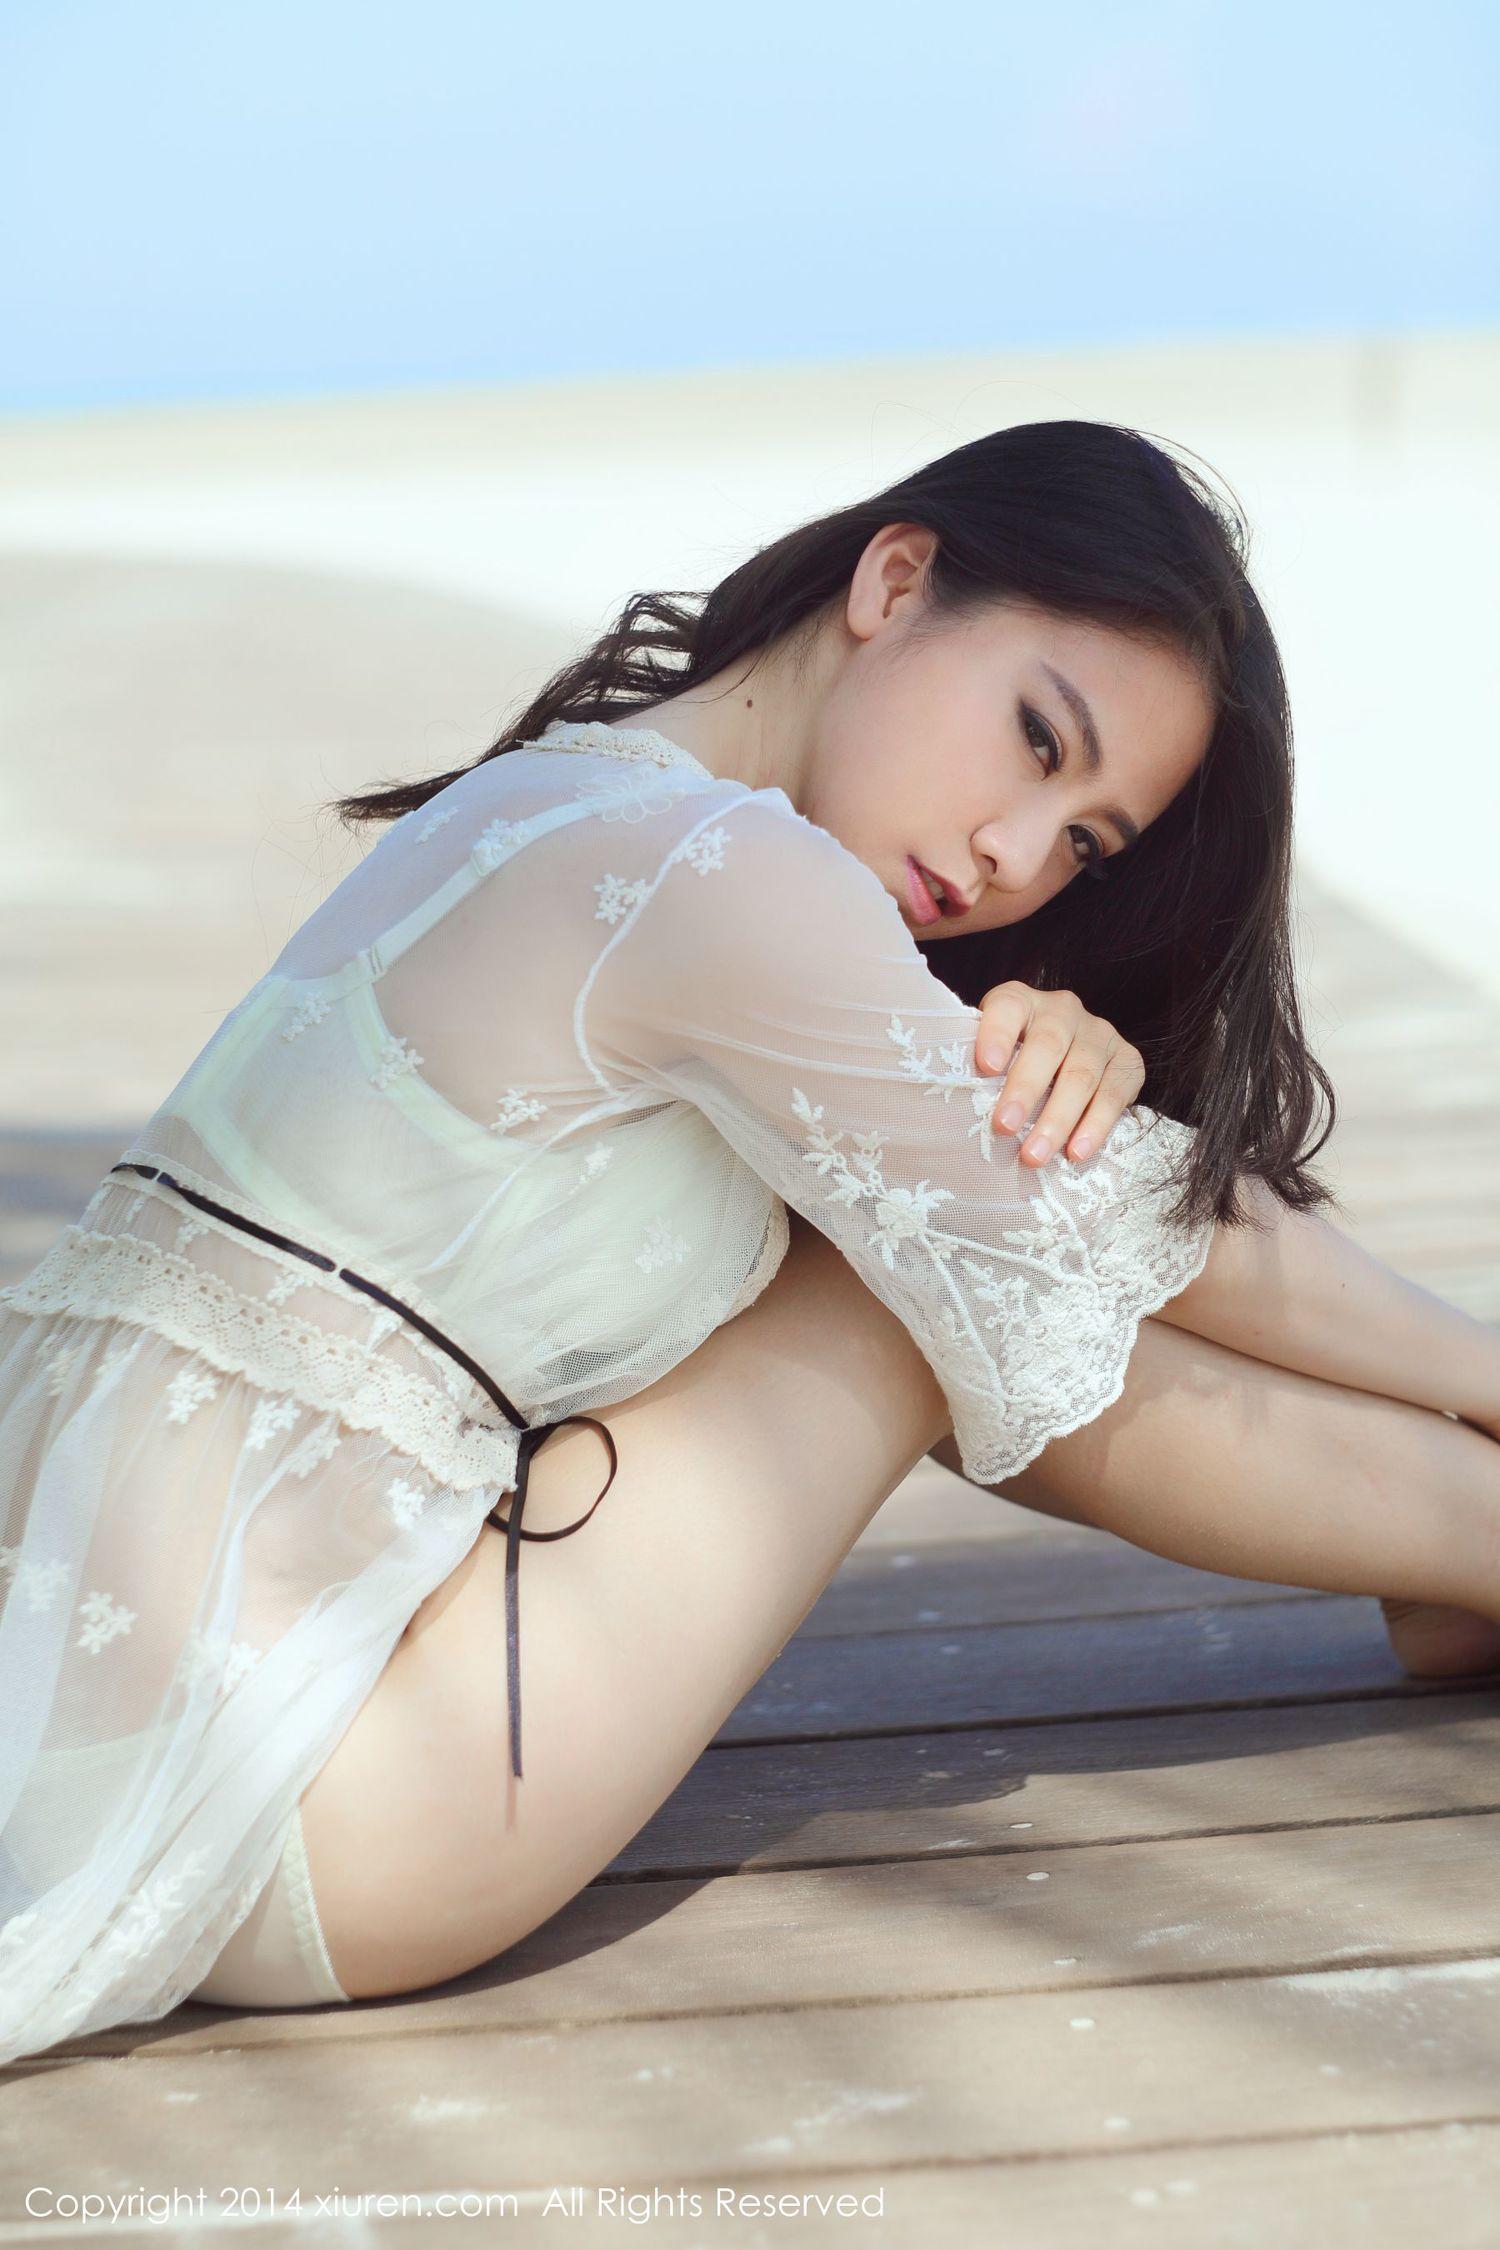 Sissi诗诗《户外海边+酒店室内混搭》 [秀人网XiuRen] No.160 写真集4